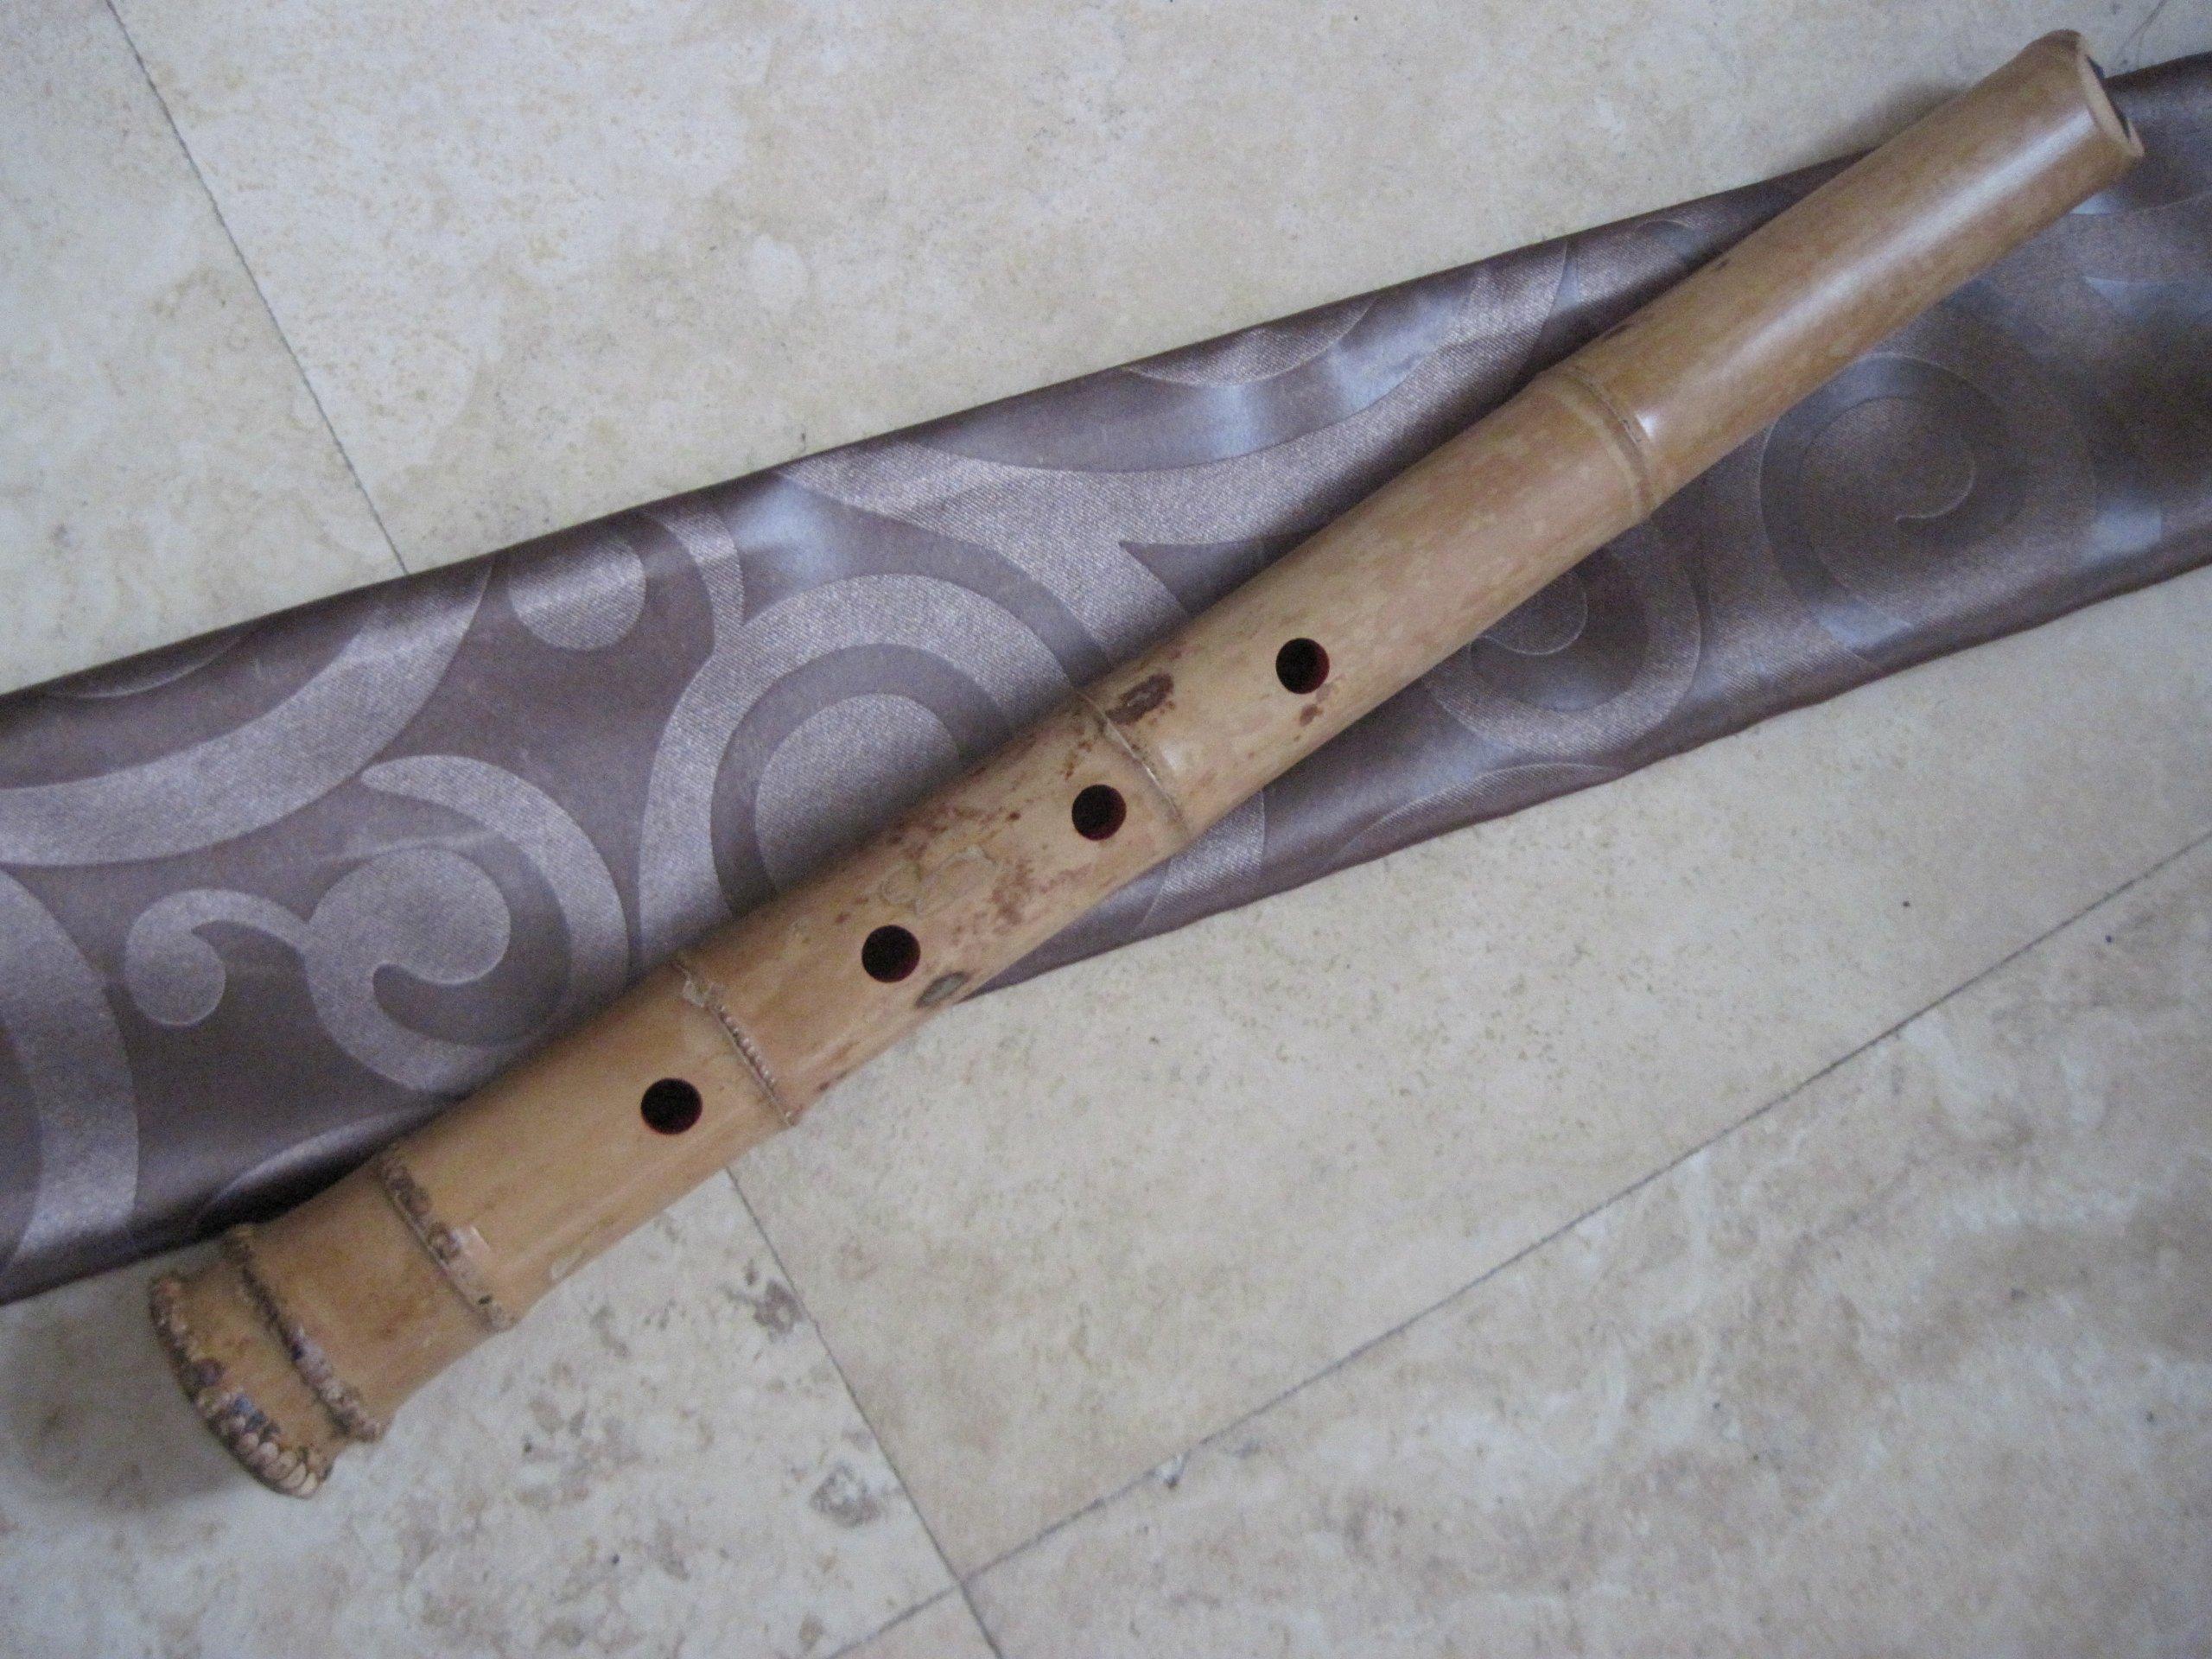 1.5 Shakuhachi Pentatonic w. Root End & KINKO Voicing Mouthpiece -- Zen Instrument